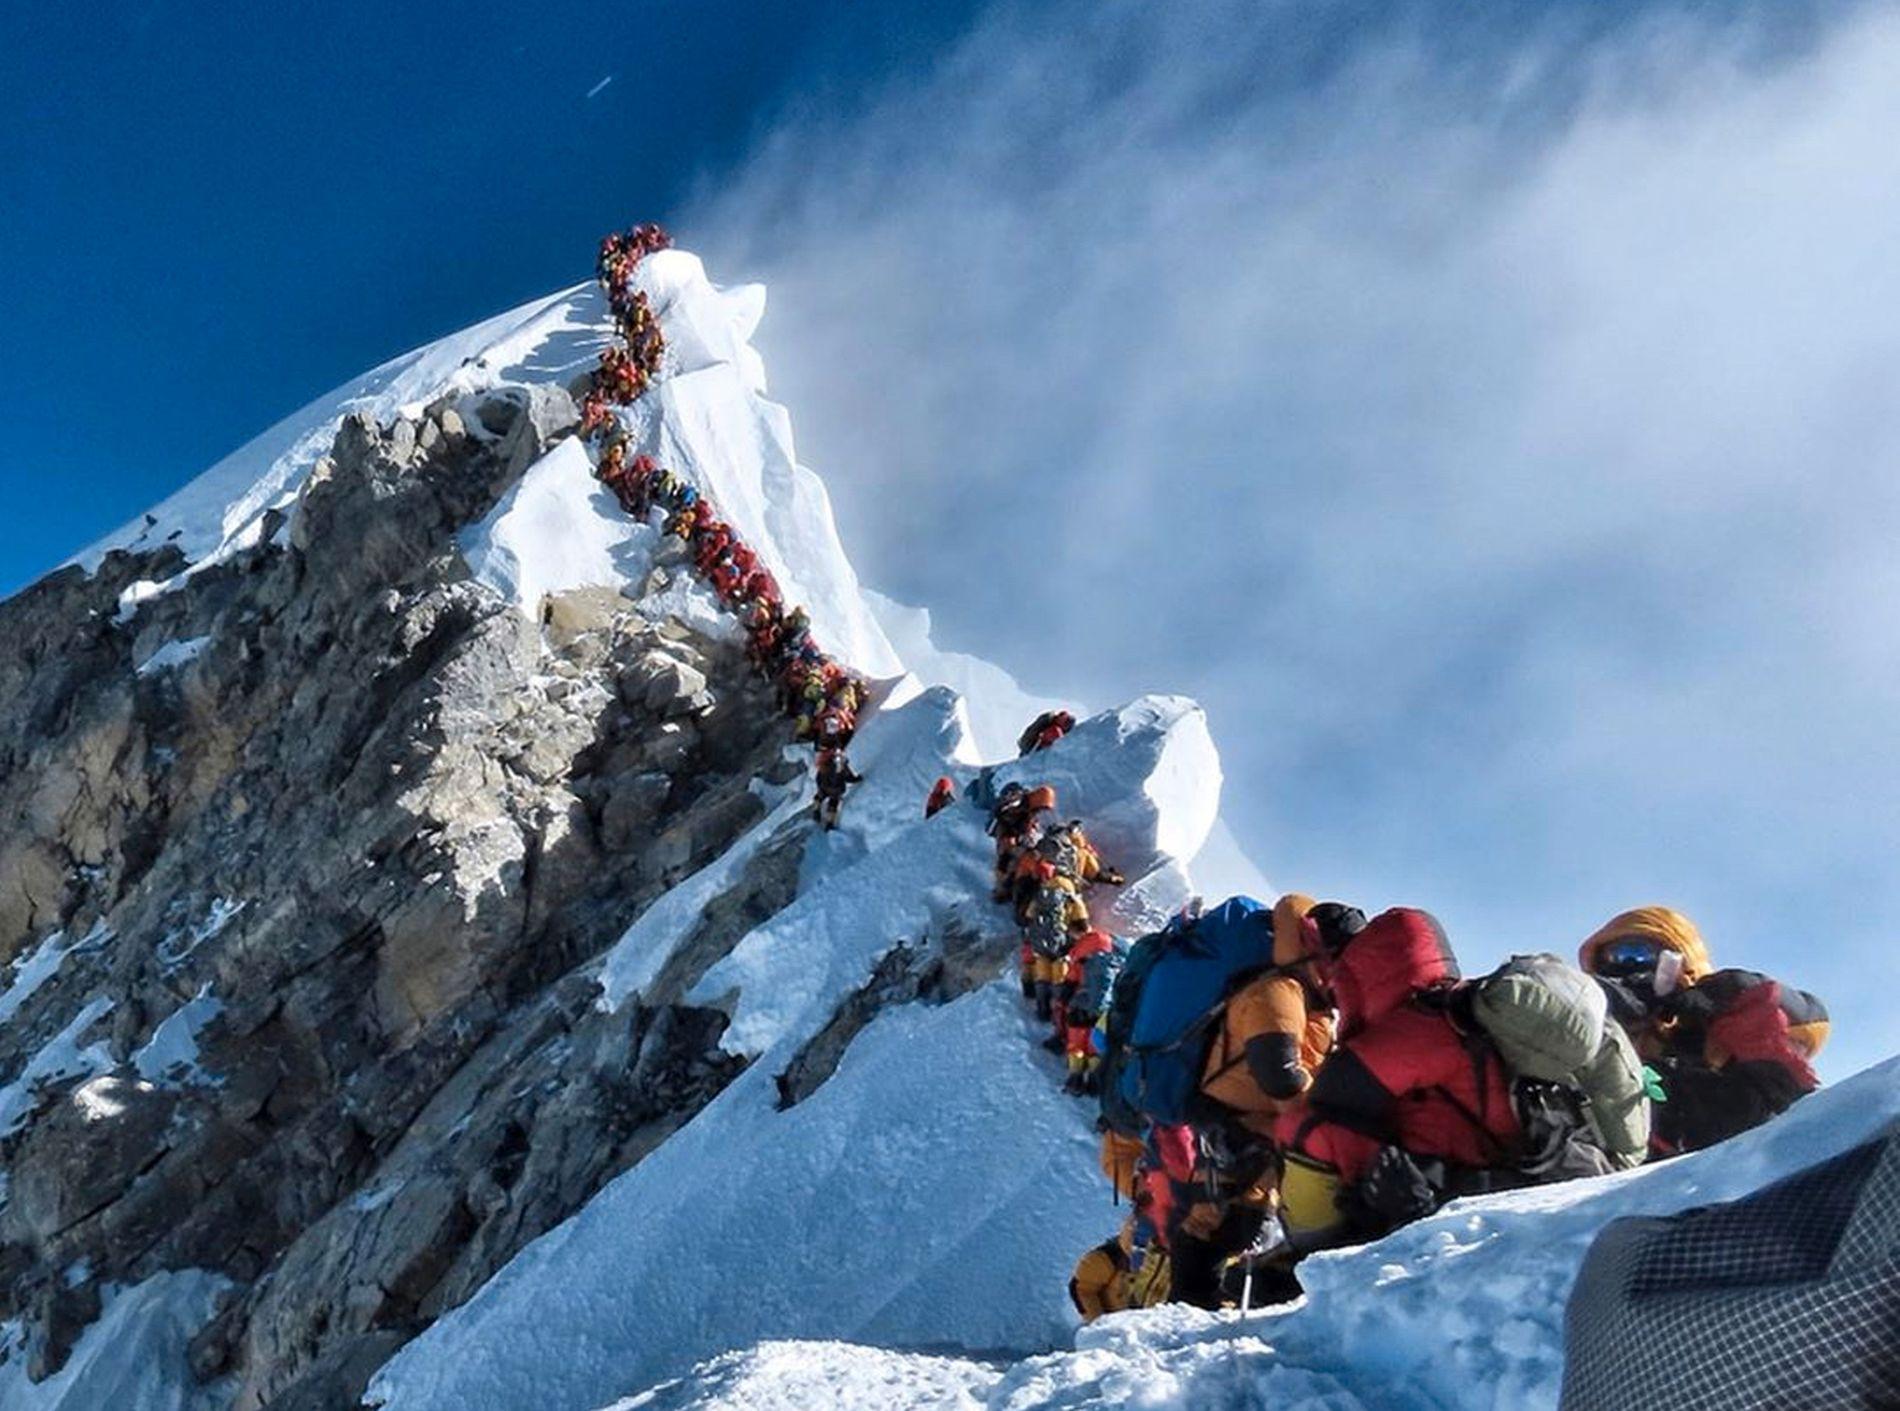 Dette bildet av de lange køene på Mount Everest under årets klatresesong, har gått verden rundt. Foto: Nirmal Purja / Nimsdai Project Possible / AP / NTB scanpix.